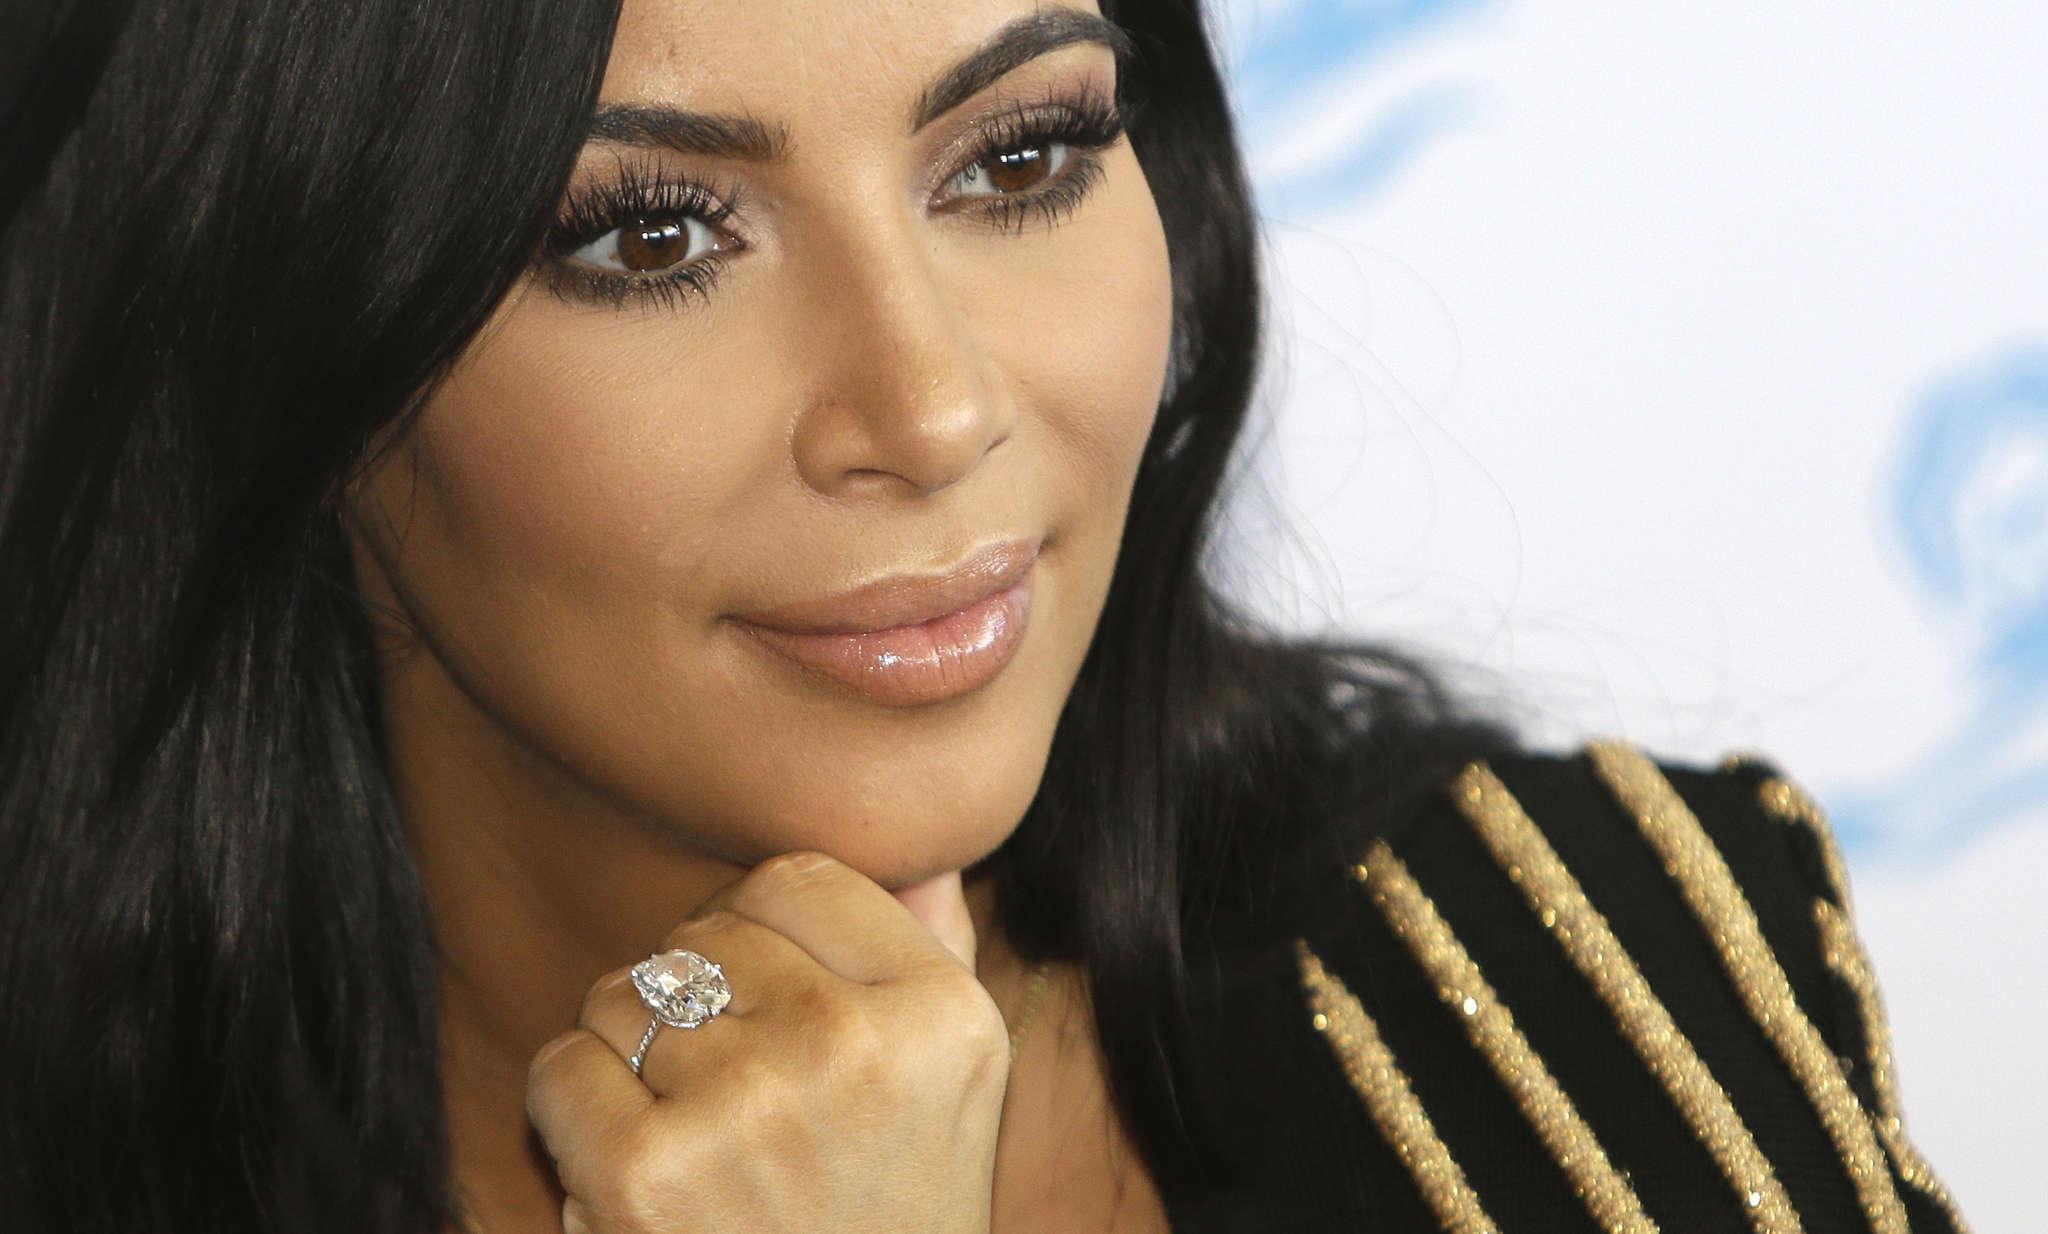 Kim Kardashian has returned home.